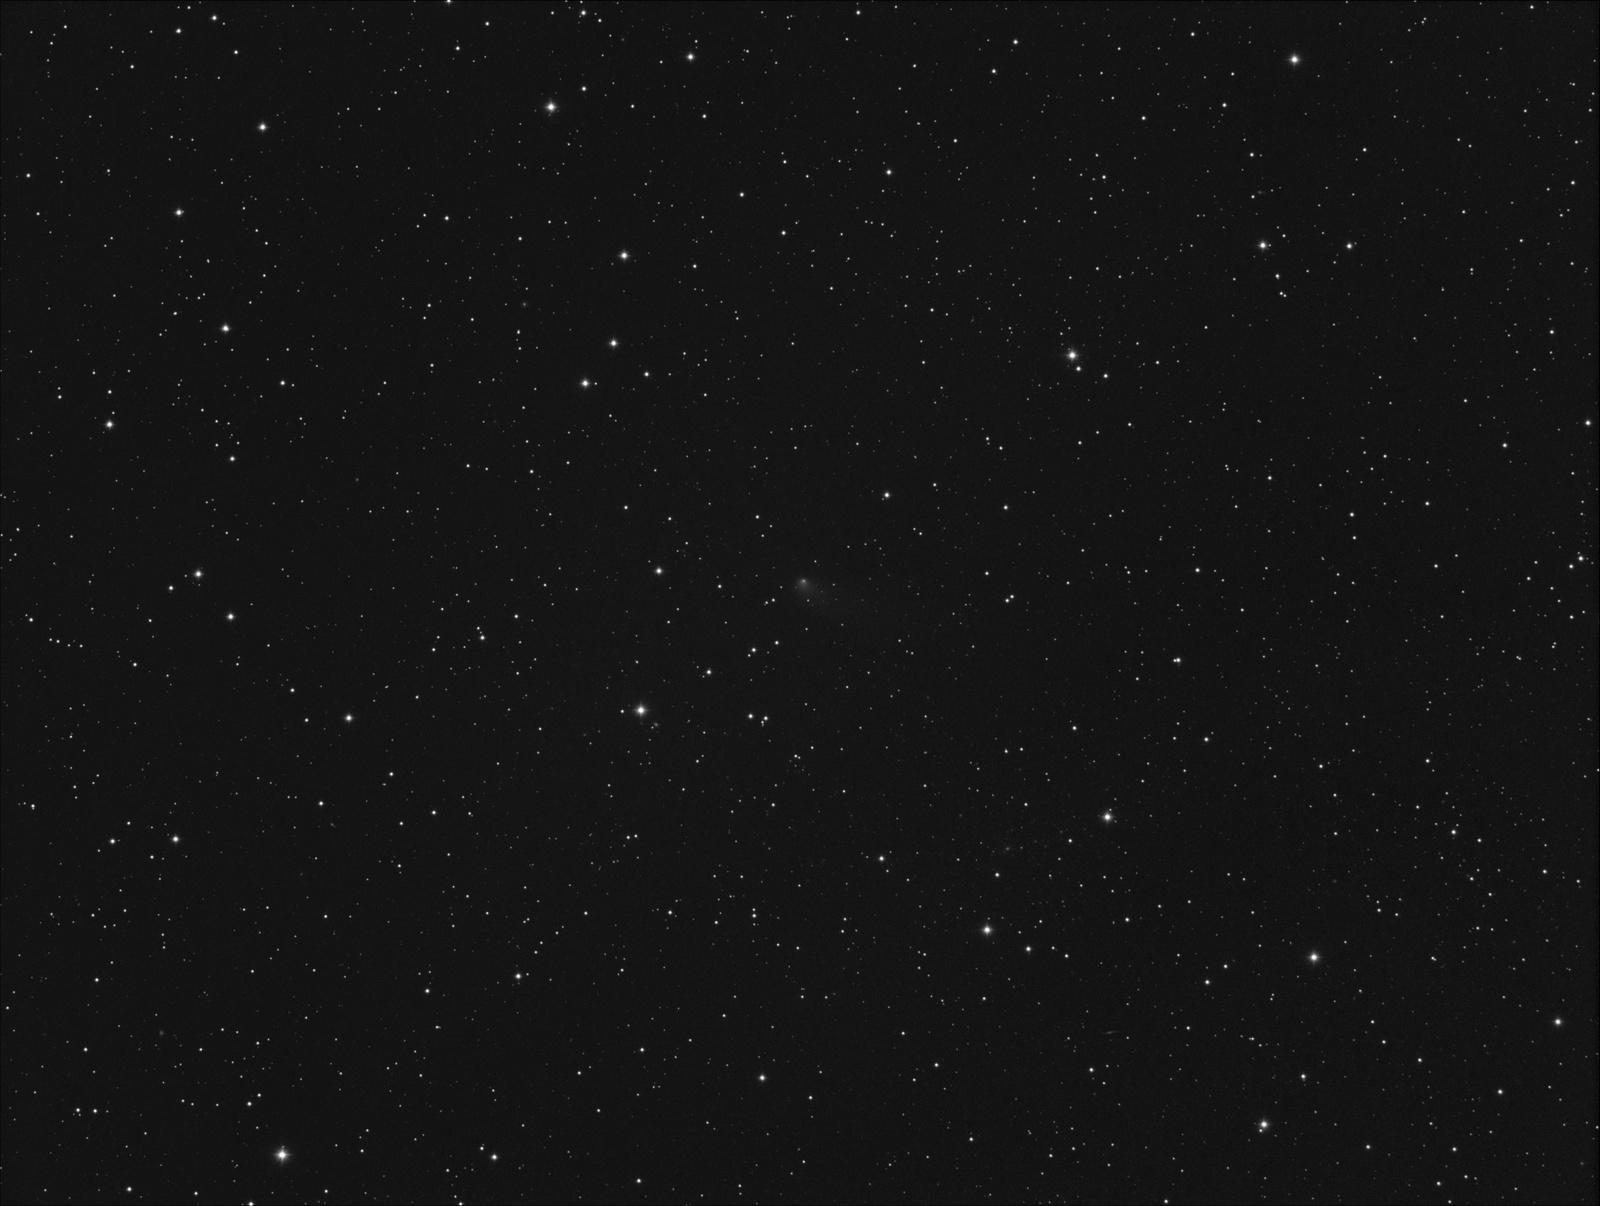 1934901998_190206KometaStephan-OtermaL30x120TS383.thumb.jpg.fdfdbb7027d35b7726b6ac49f5310545.jpg